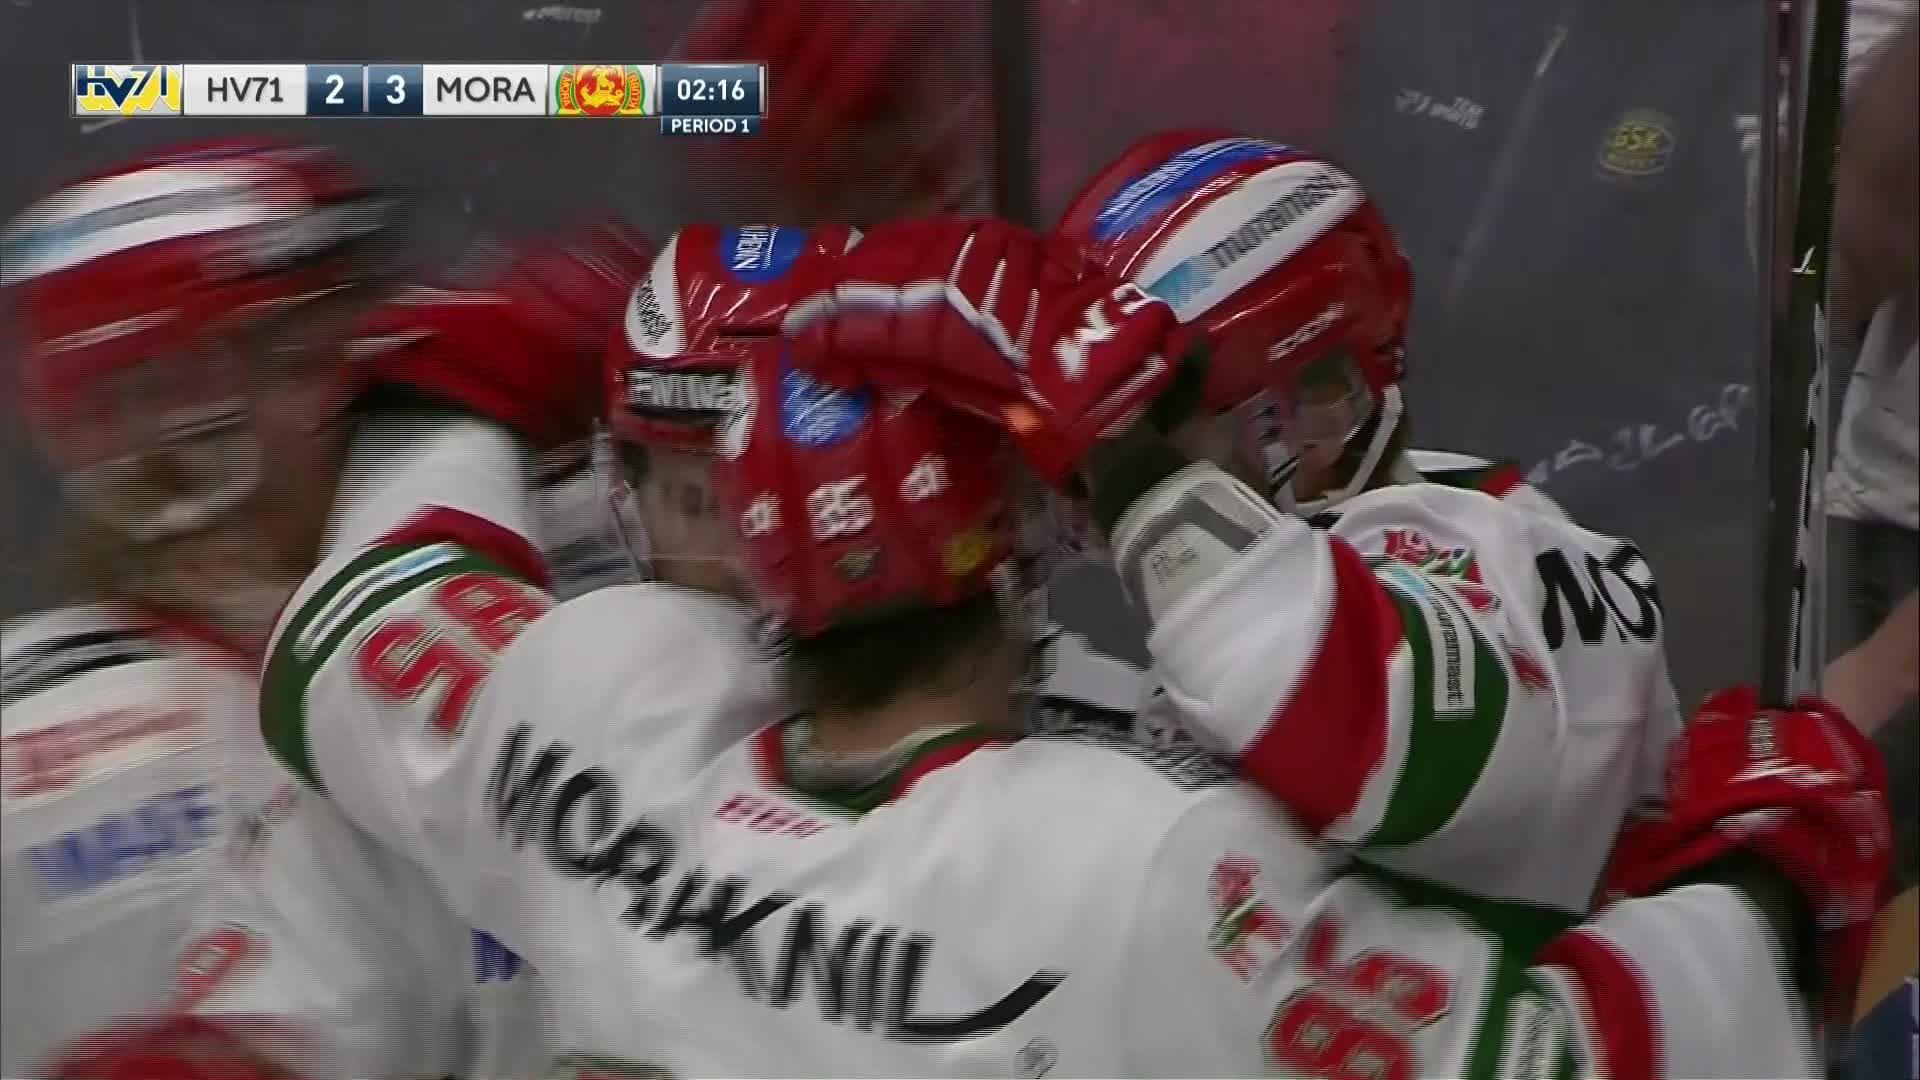 HV71 - Mora IK 2-3